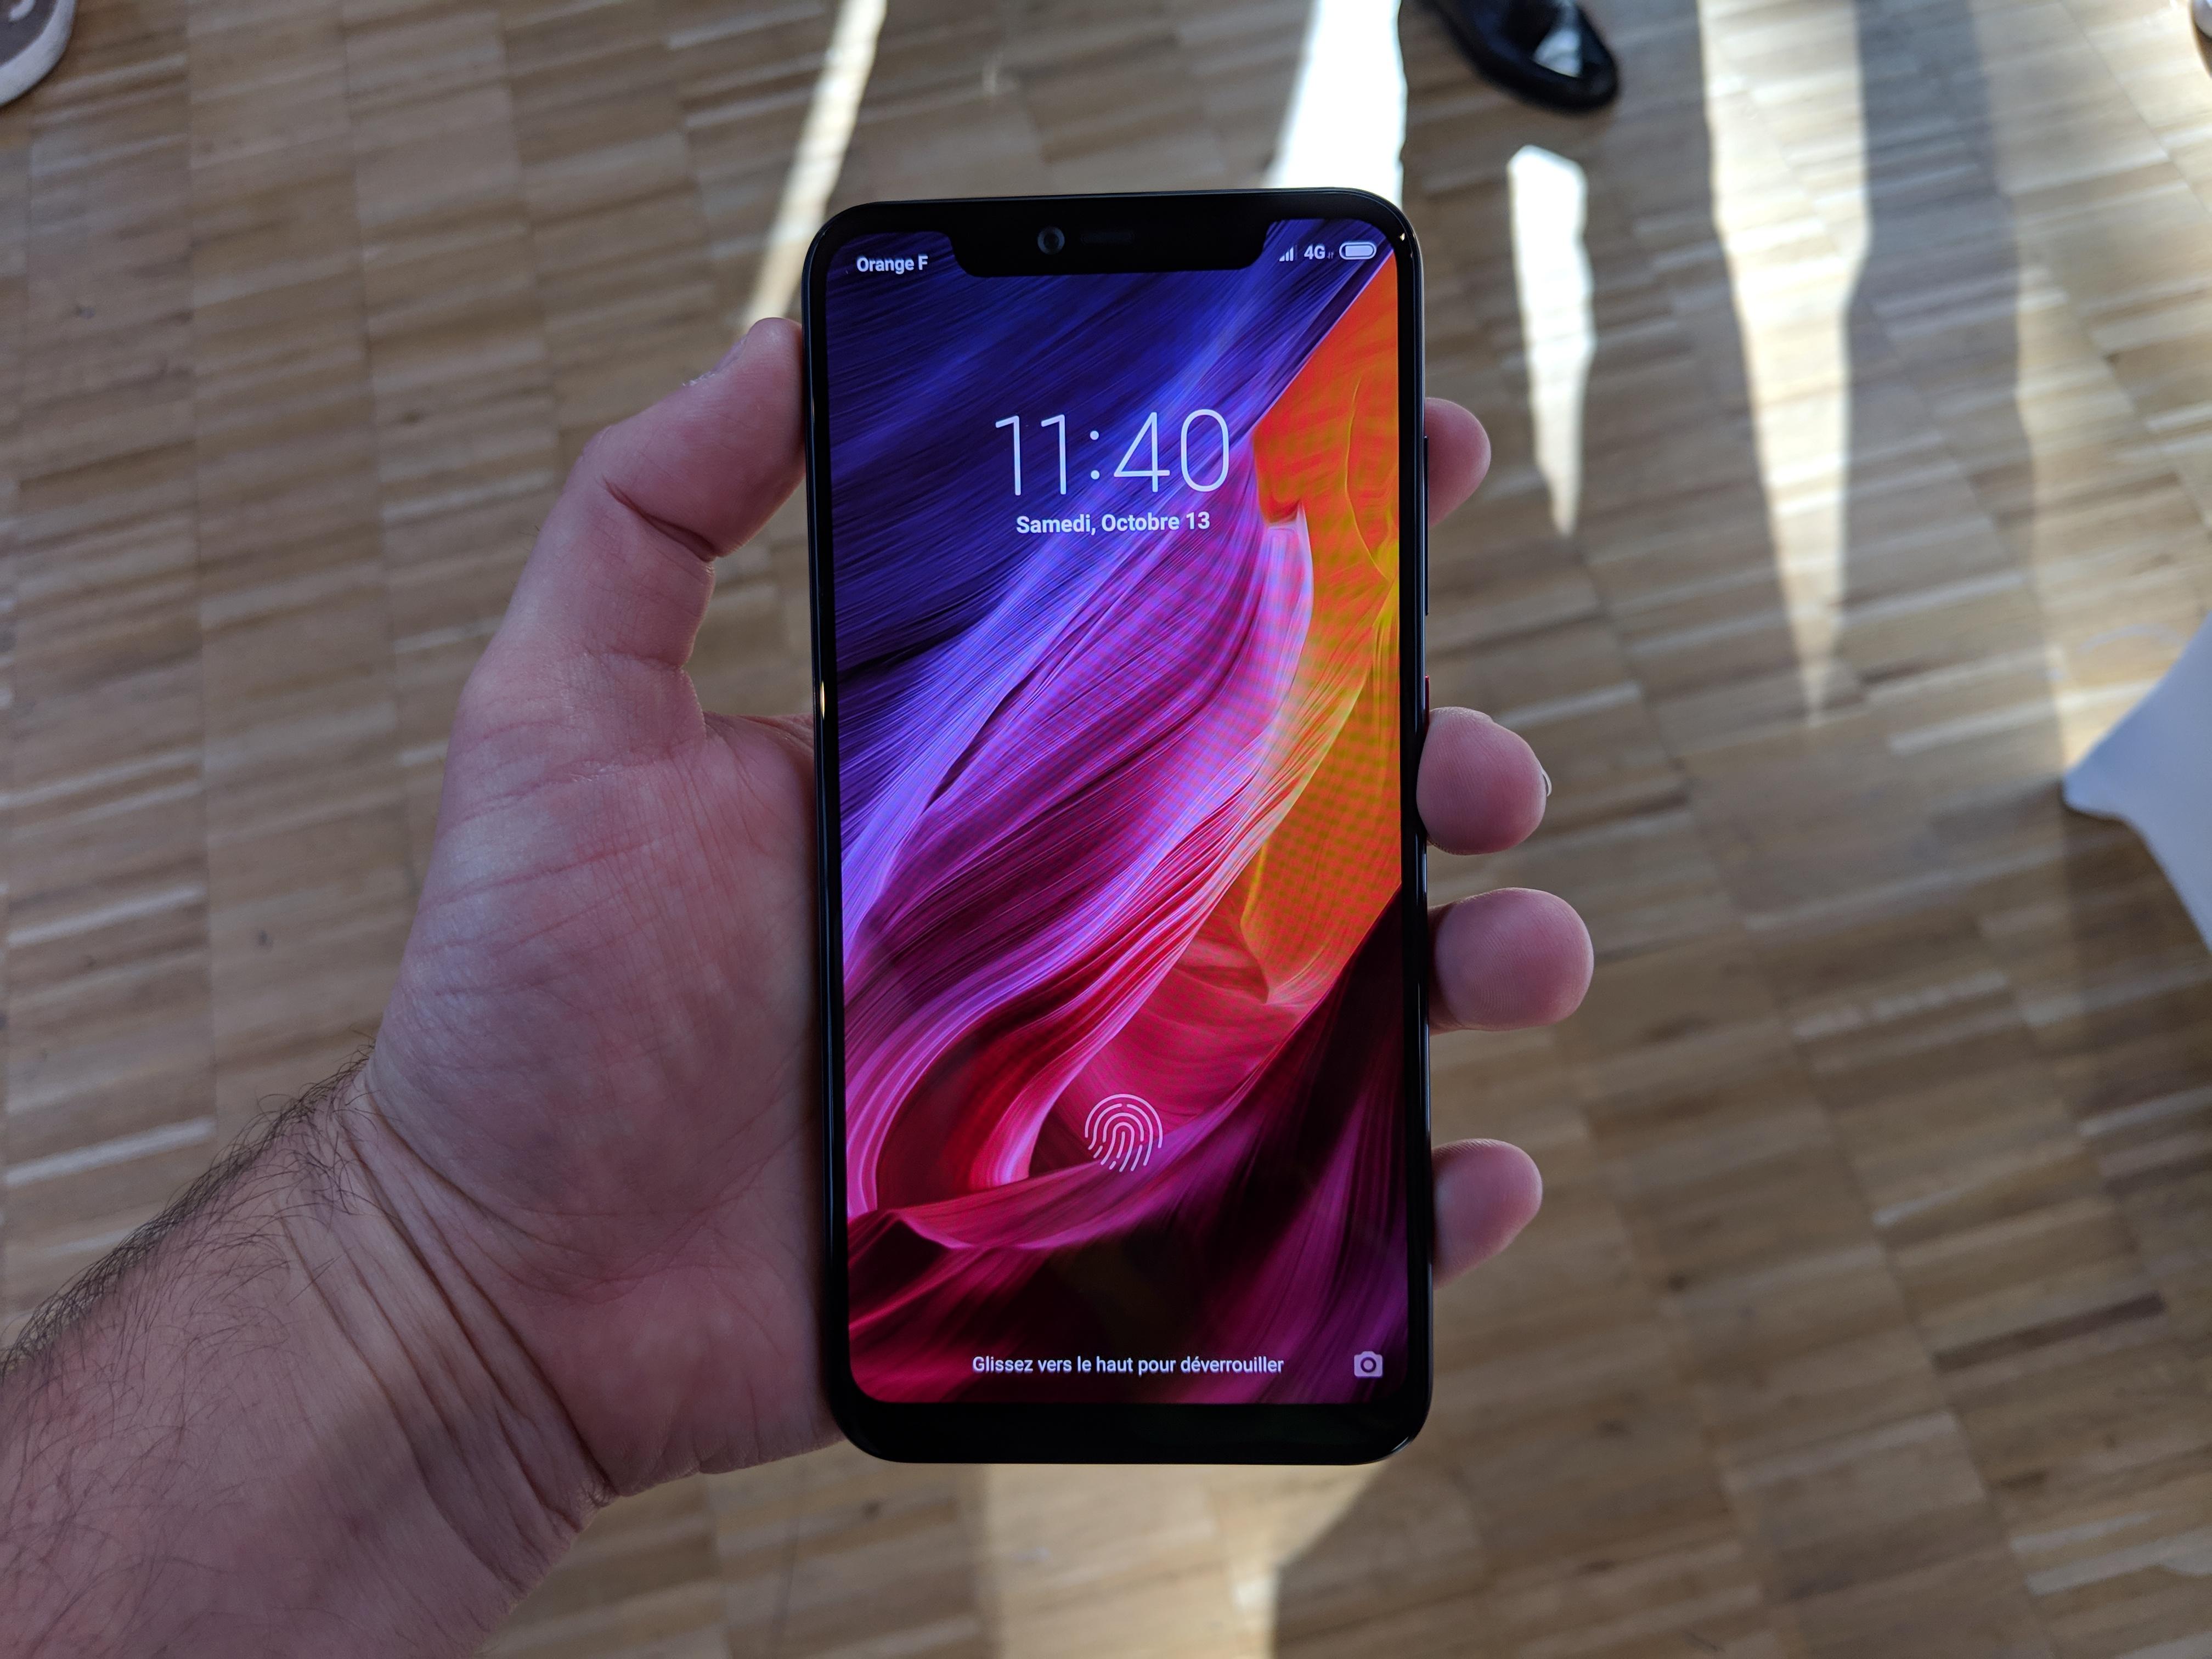 iPad Pro (2018), Xiaomi Mi 8 Pro en Europe, et Android Pie chez Samsung – Tech'spresso